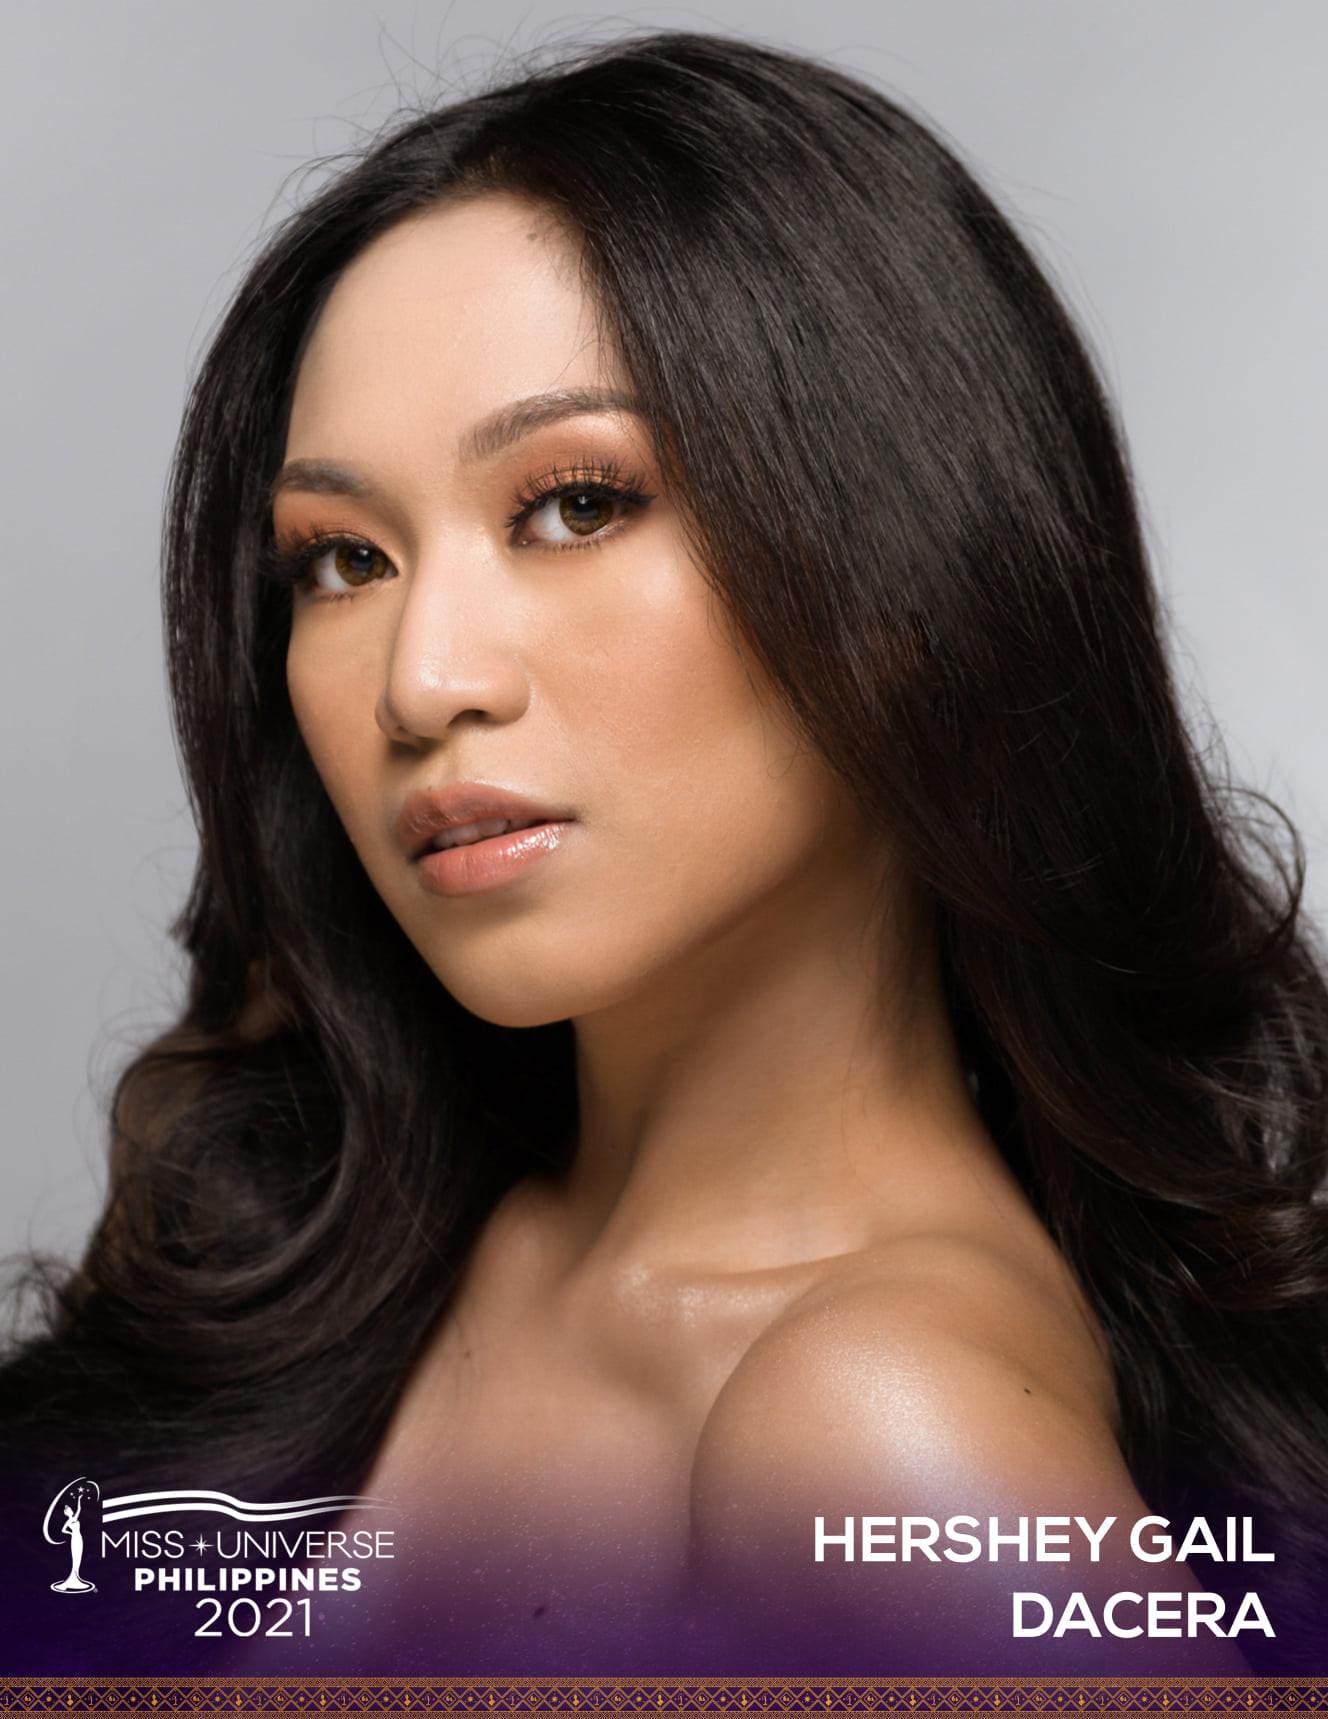 pre-candidatas a miss universe philippines 2021. - Página 6 AlGvJS